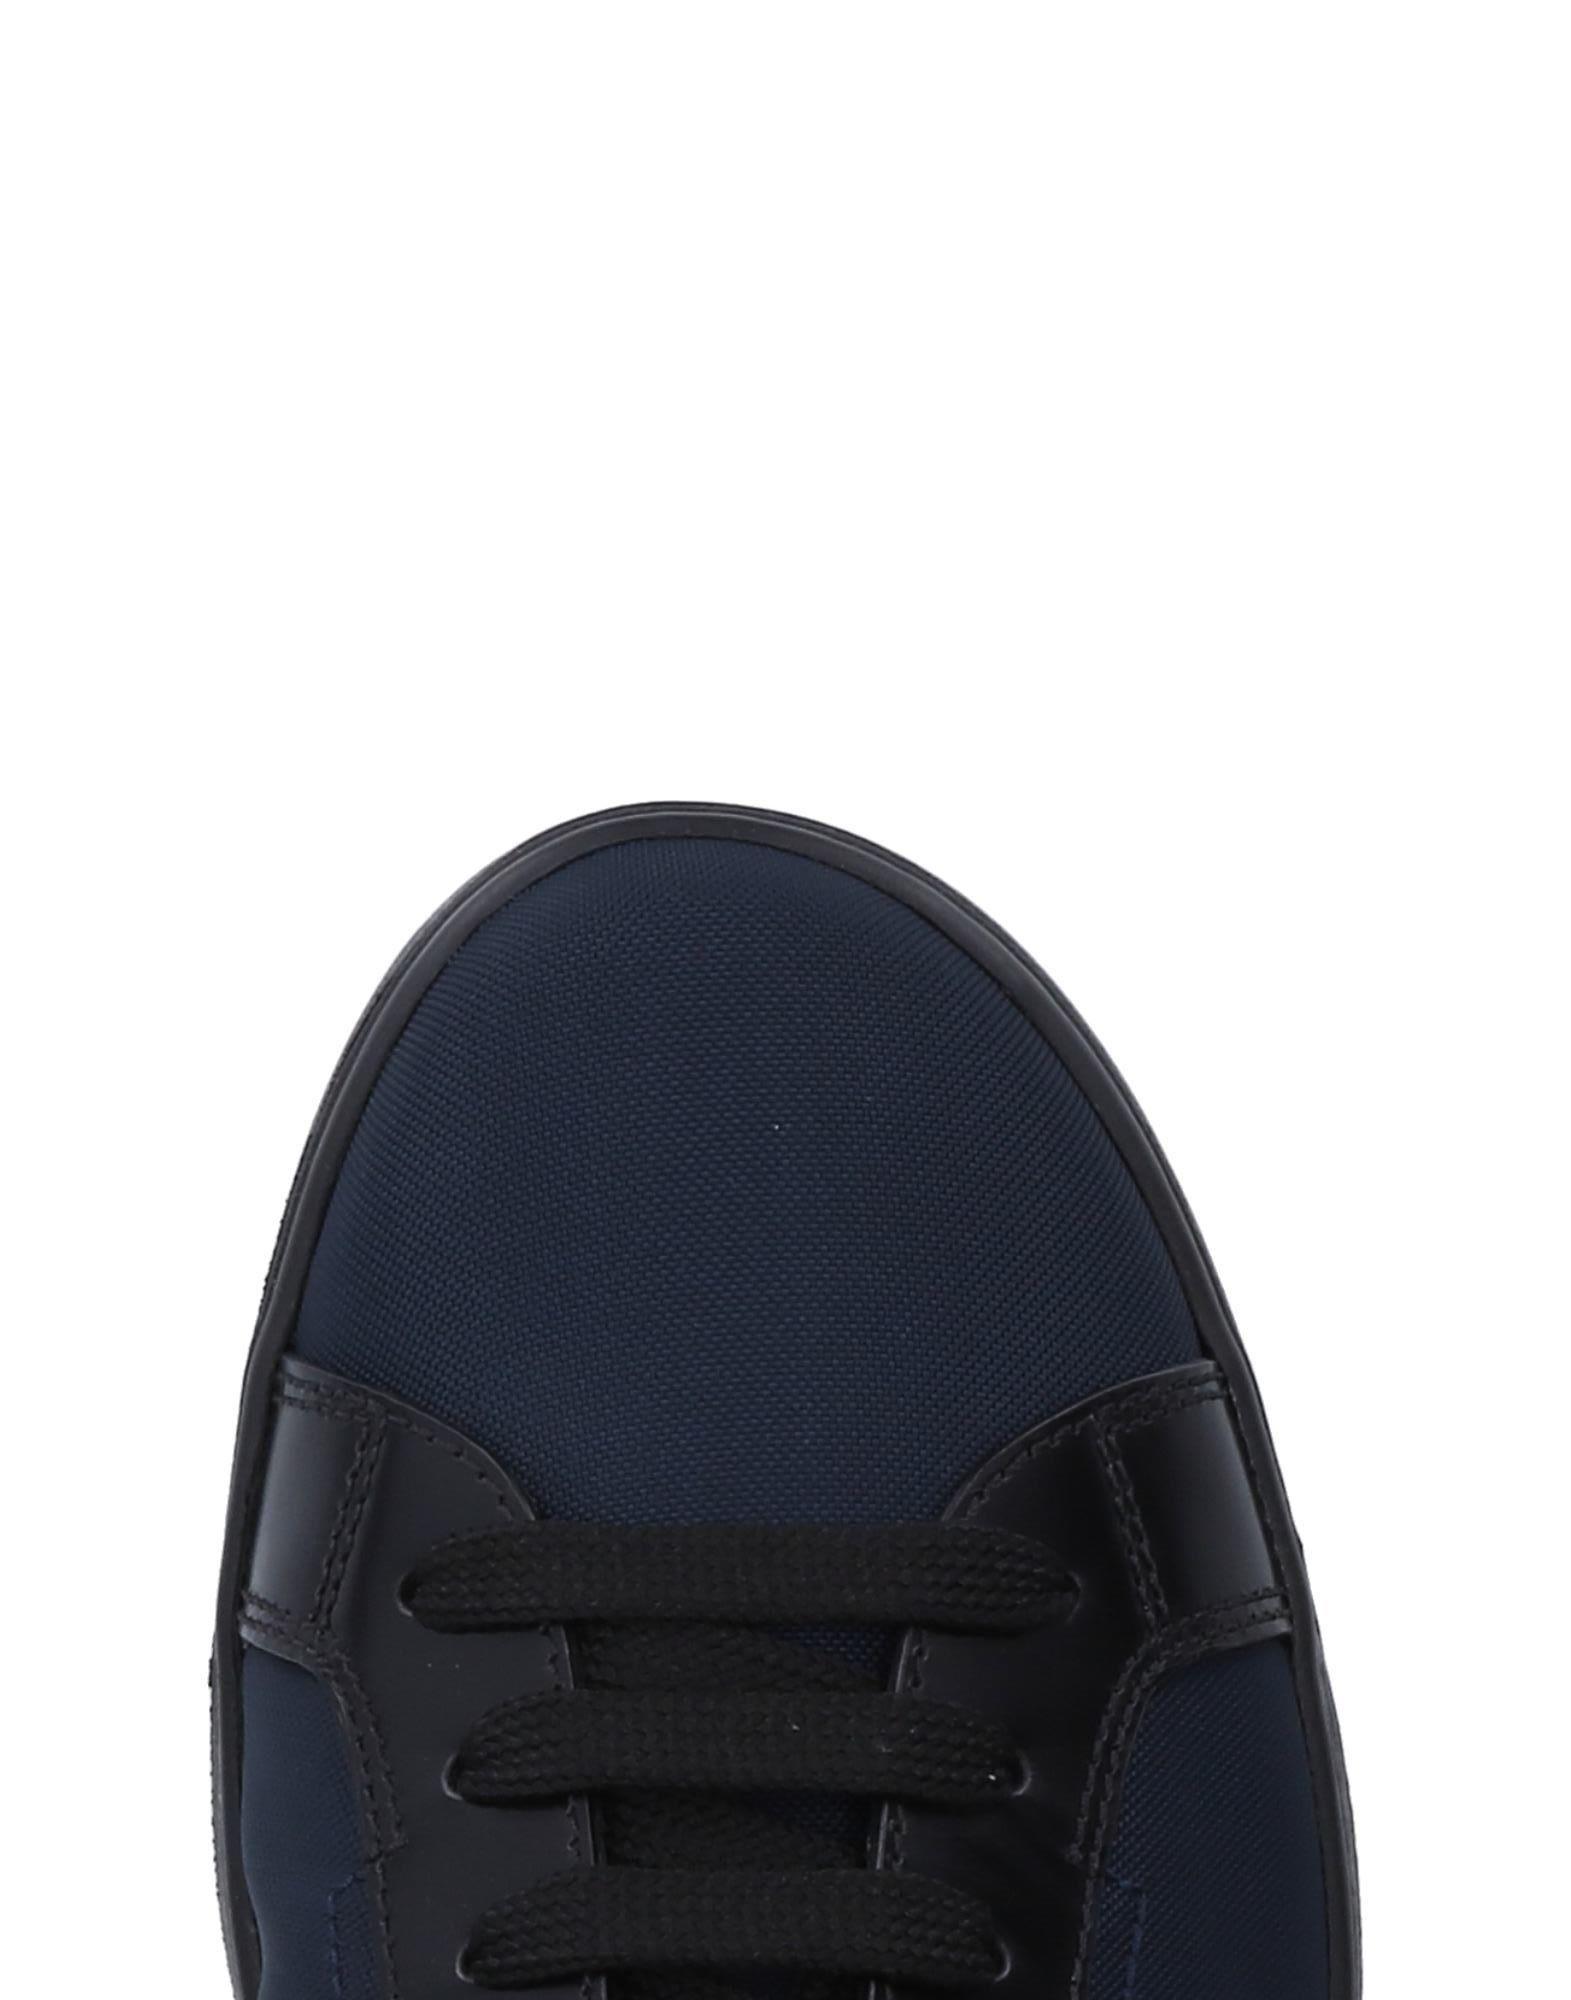 Prada 11510284MQ Sport Sneakers Herren  11510284MQ Prada Gute Qualität beliebte Schuhe 7b6ec3